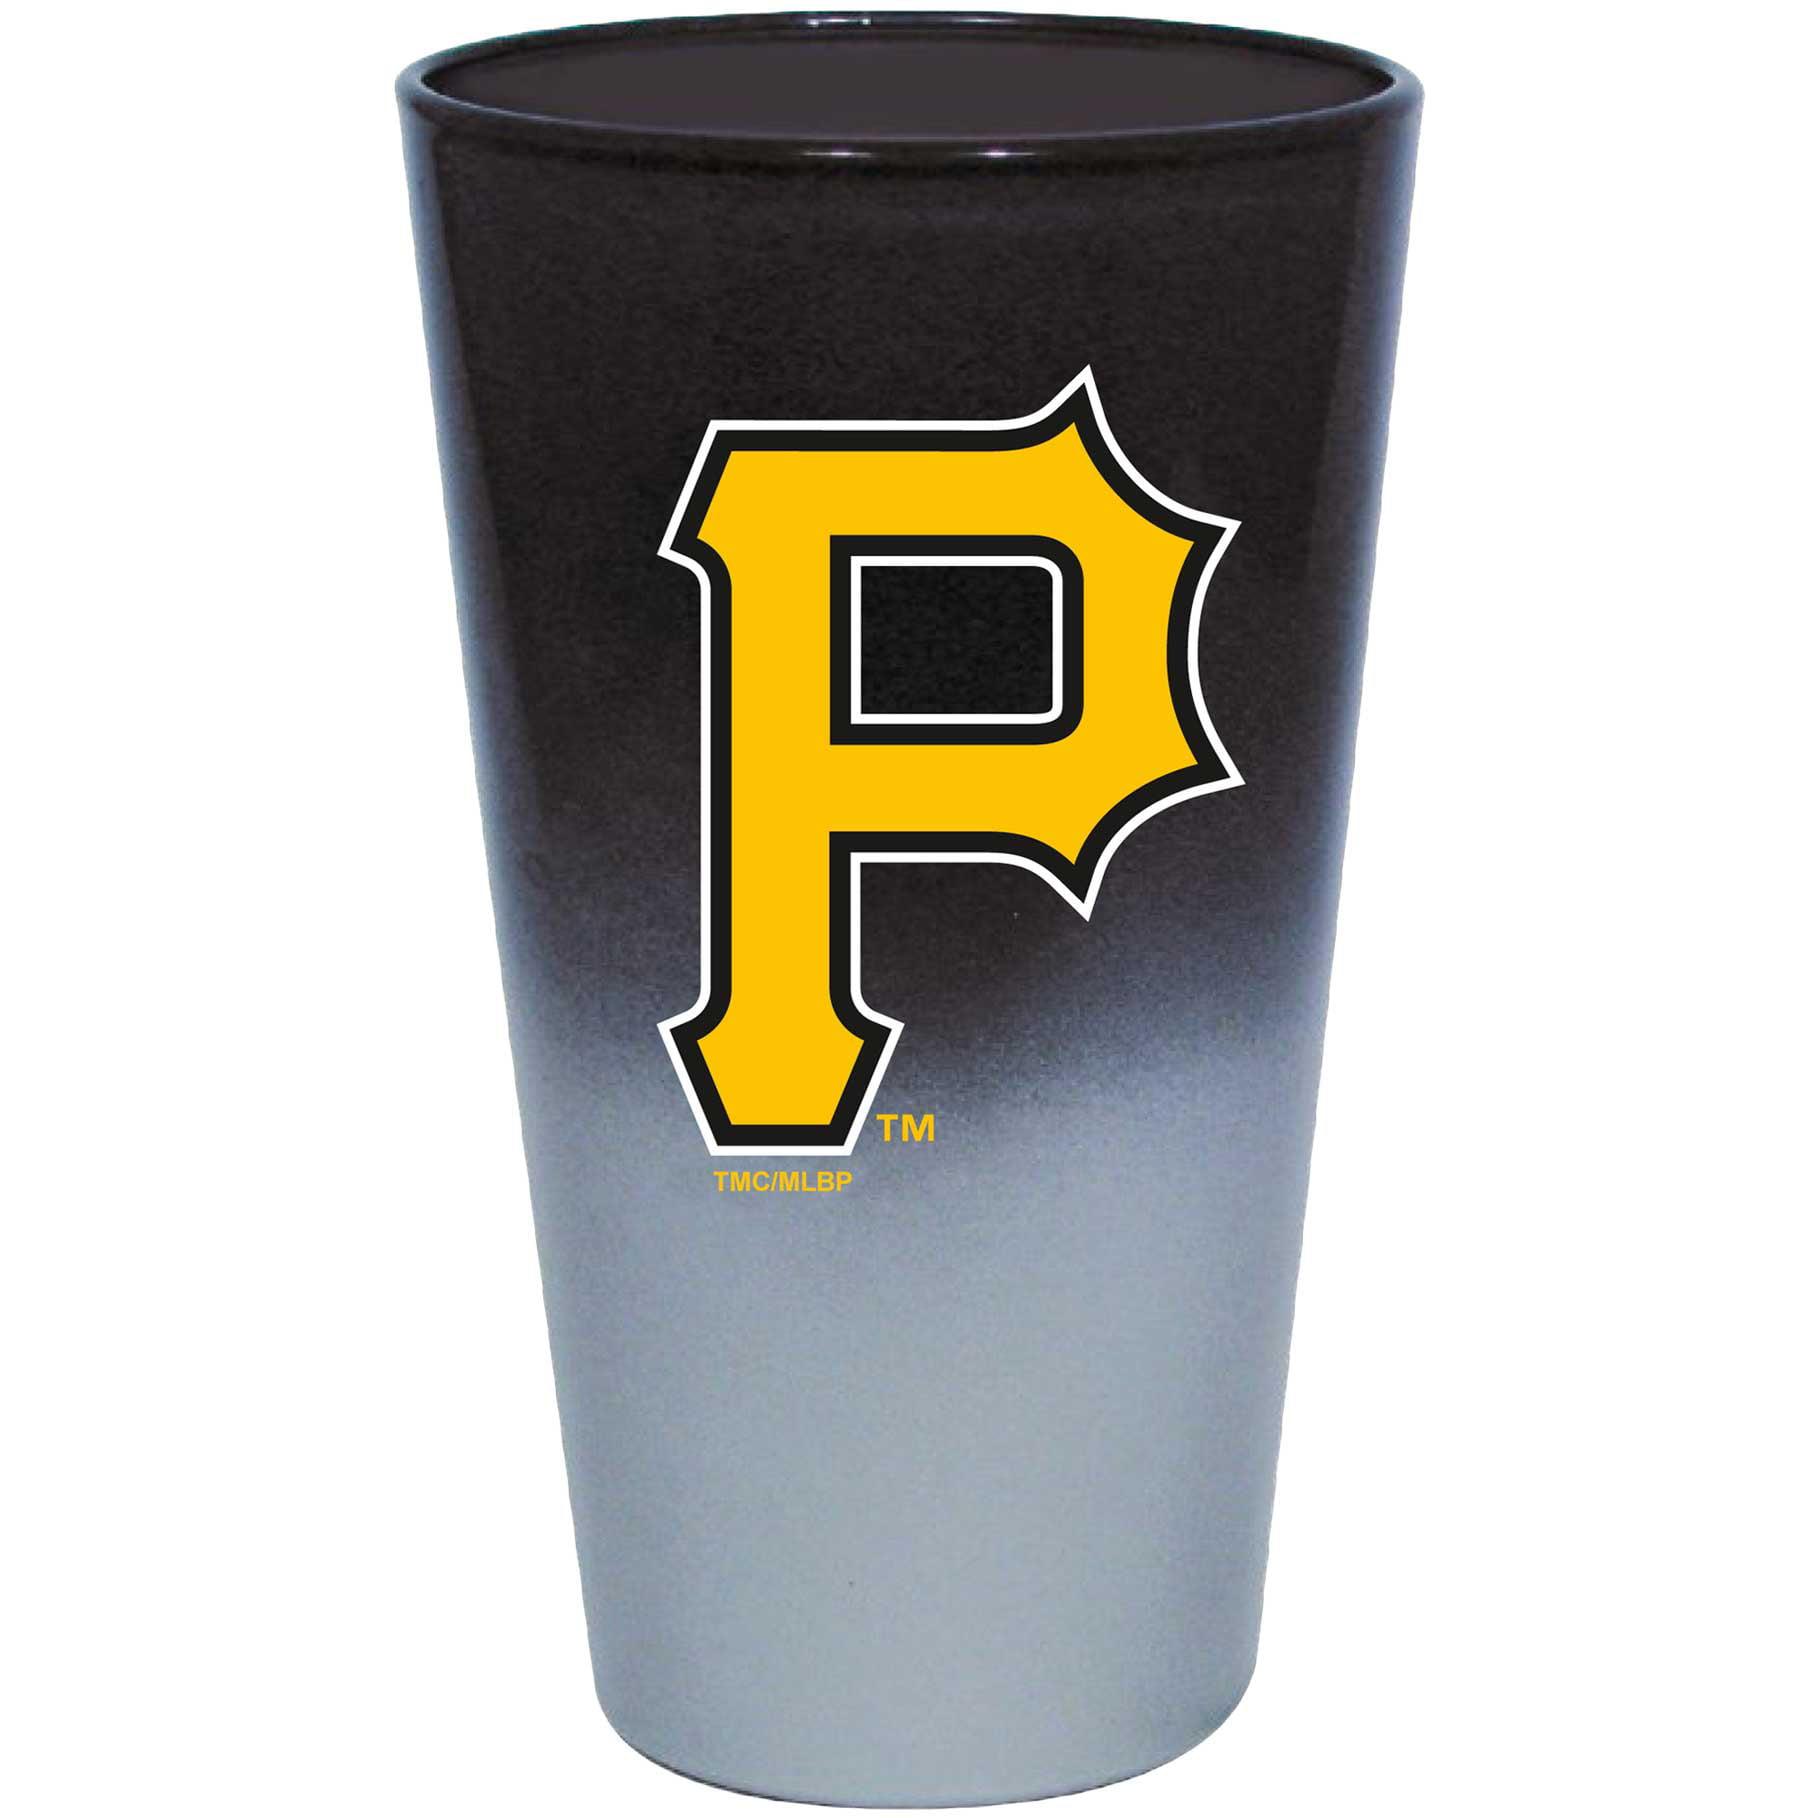 Pittsburgh Pirates 16oz. Two-Tone Mixing Glass - No Size